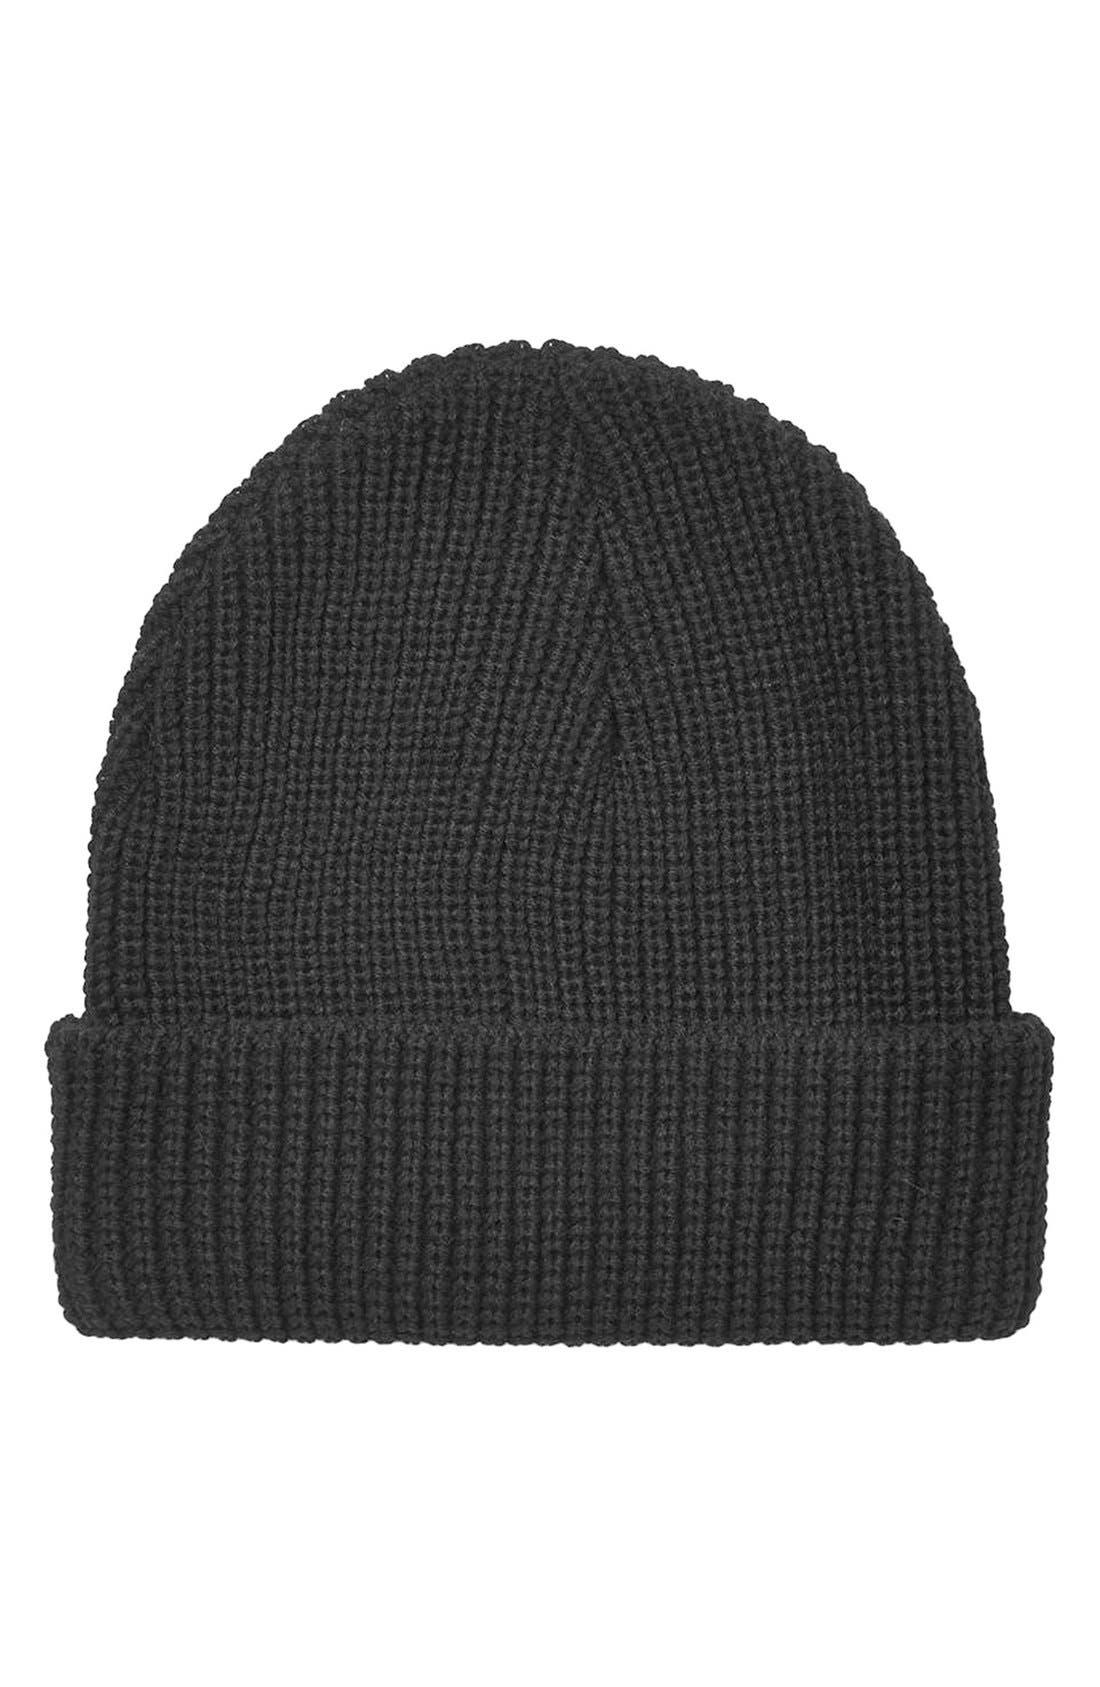 Main Image - Topshop Slouchy Rib Knit Beanie